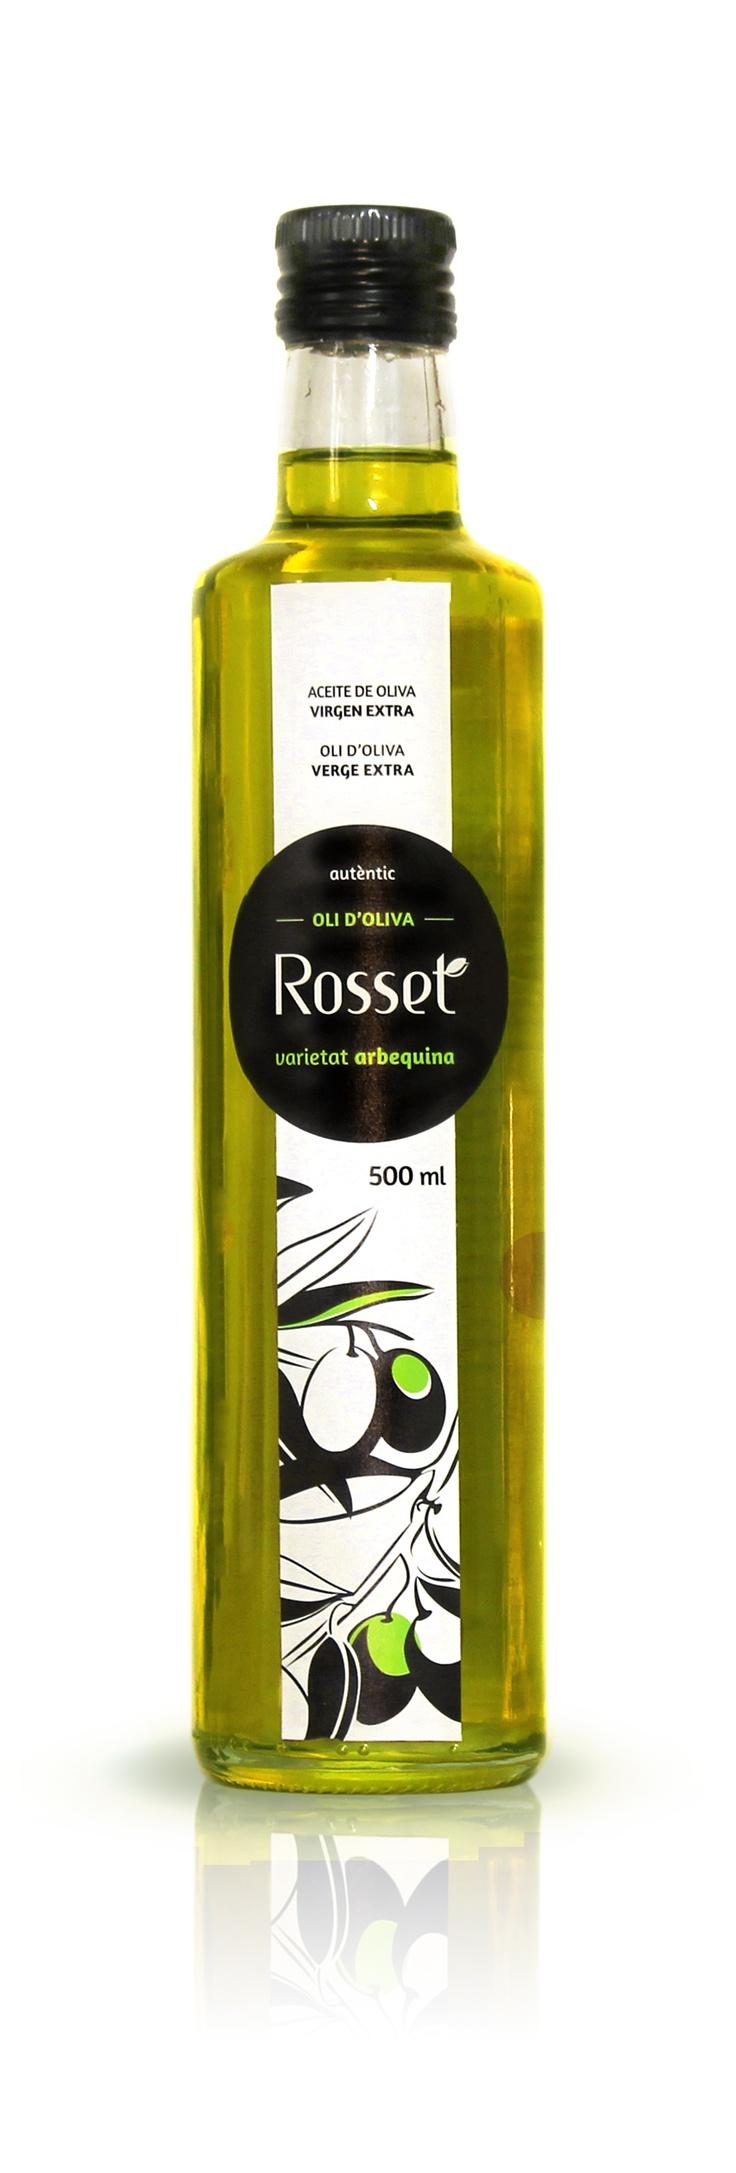 Oli d'oliva verge extra ARBEQUINA, Aceite de oliva virgen extra ARBEQUINA, Extra Virgin Olive Oil of Arbequina olives